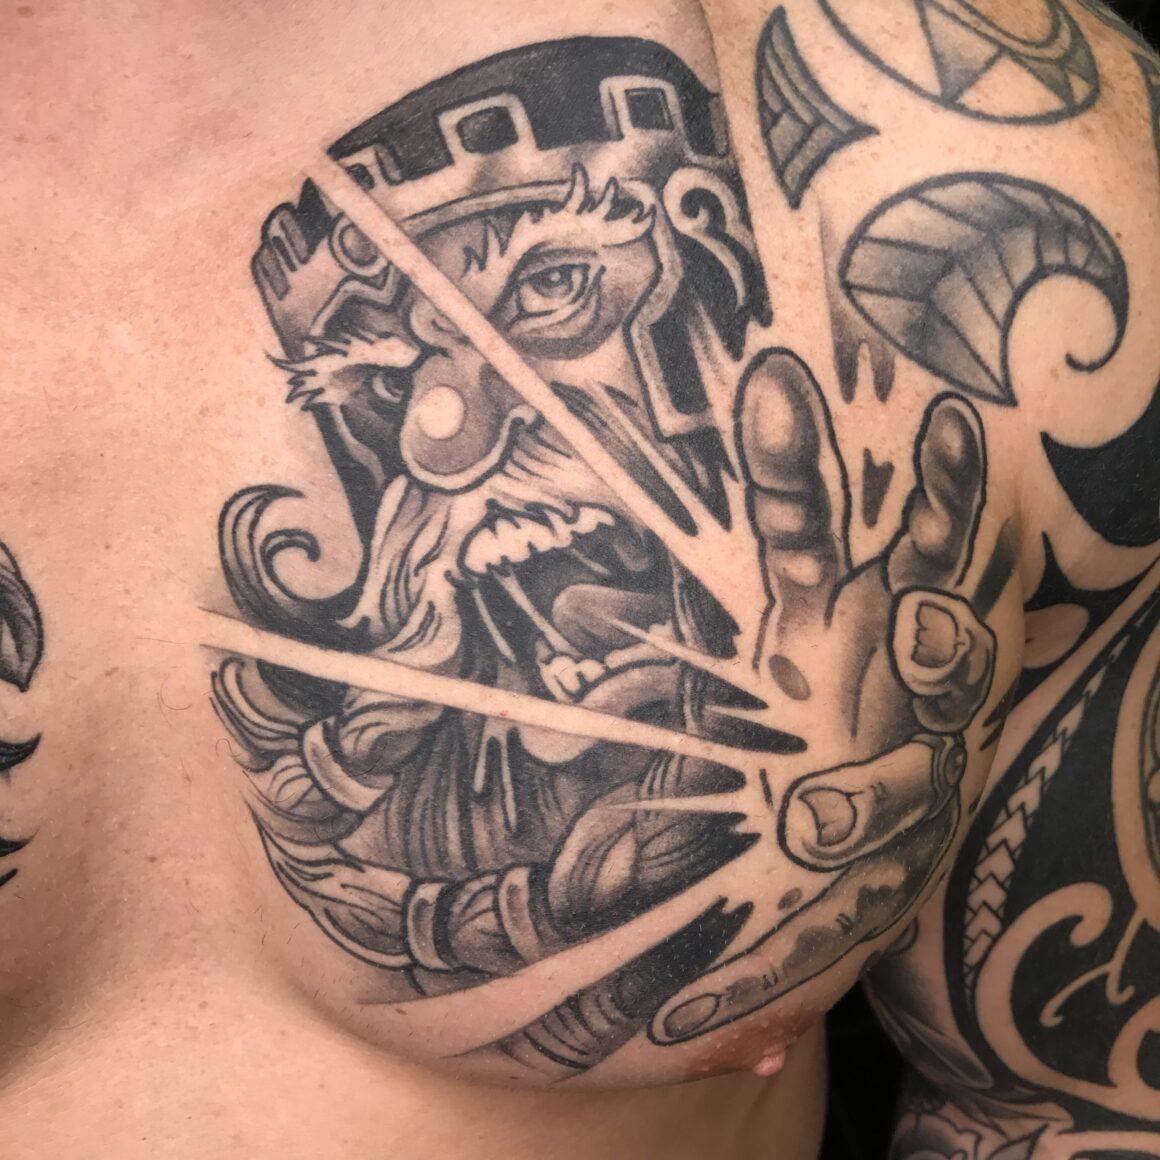 Loz, Circle of Swords Tattoo Studio, Worcester (UK)_1